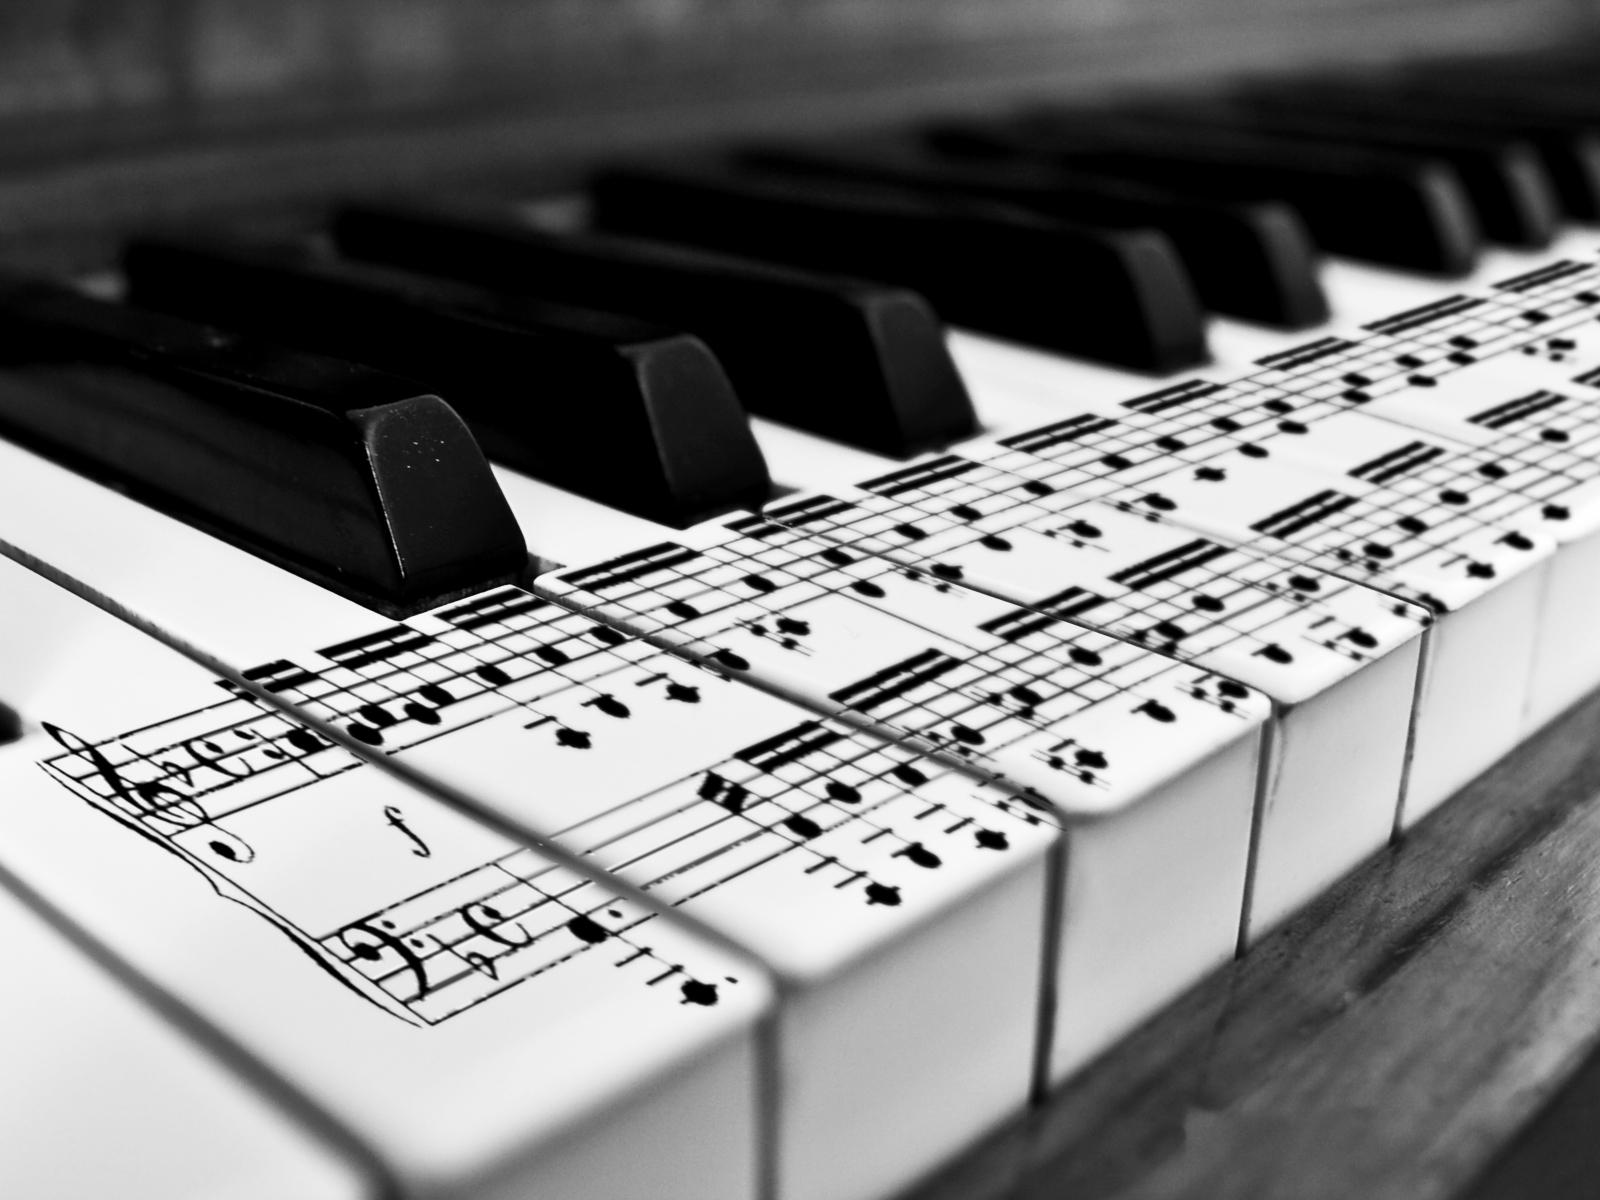 http://1.bp.blogspot.com/-lc0zmwUKiPY/UGhDVxW8qYI/AAAAAAAAE8U/RfH4UzfIkWc/s1600/Music-Notes-on-Piano-Keyboard-HD-Wallpaper--Vvallpaper.Net.jpg